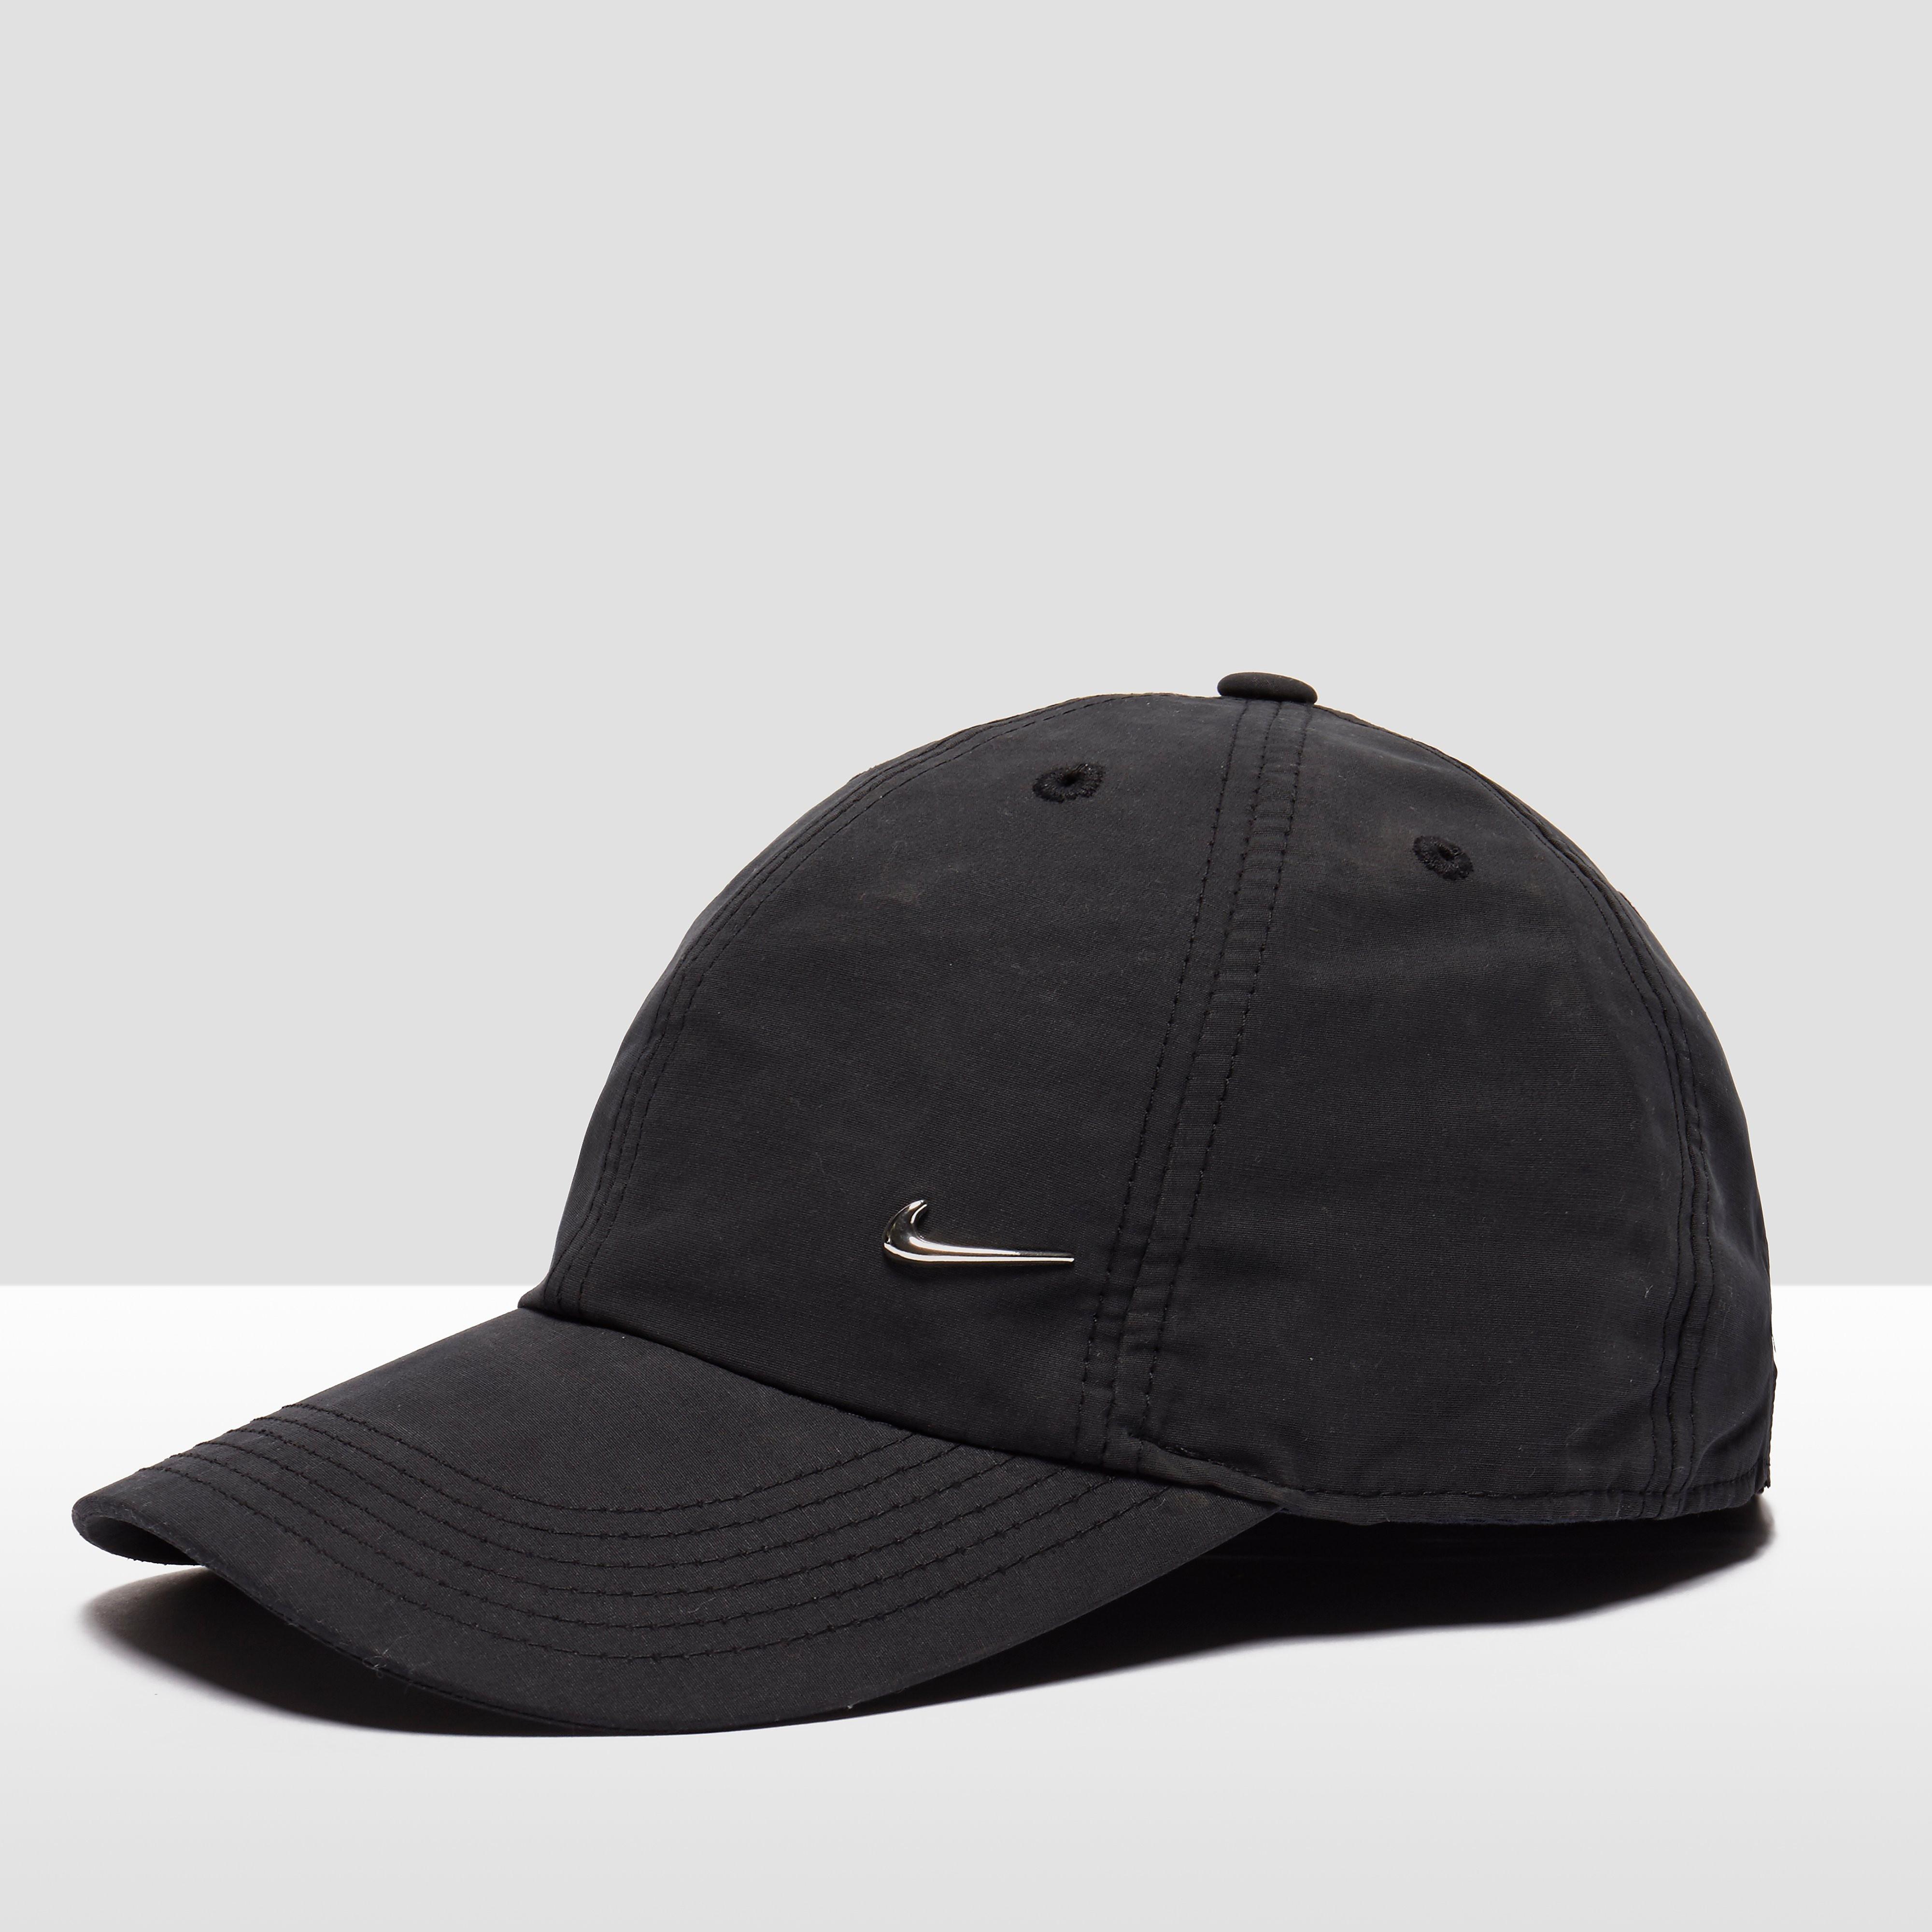 Nike Heritage 86 Metal Swoosh Adjustable Hat